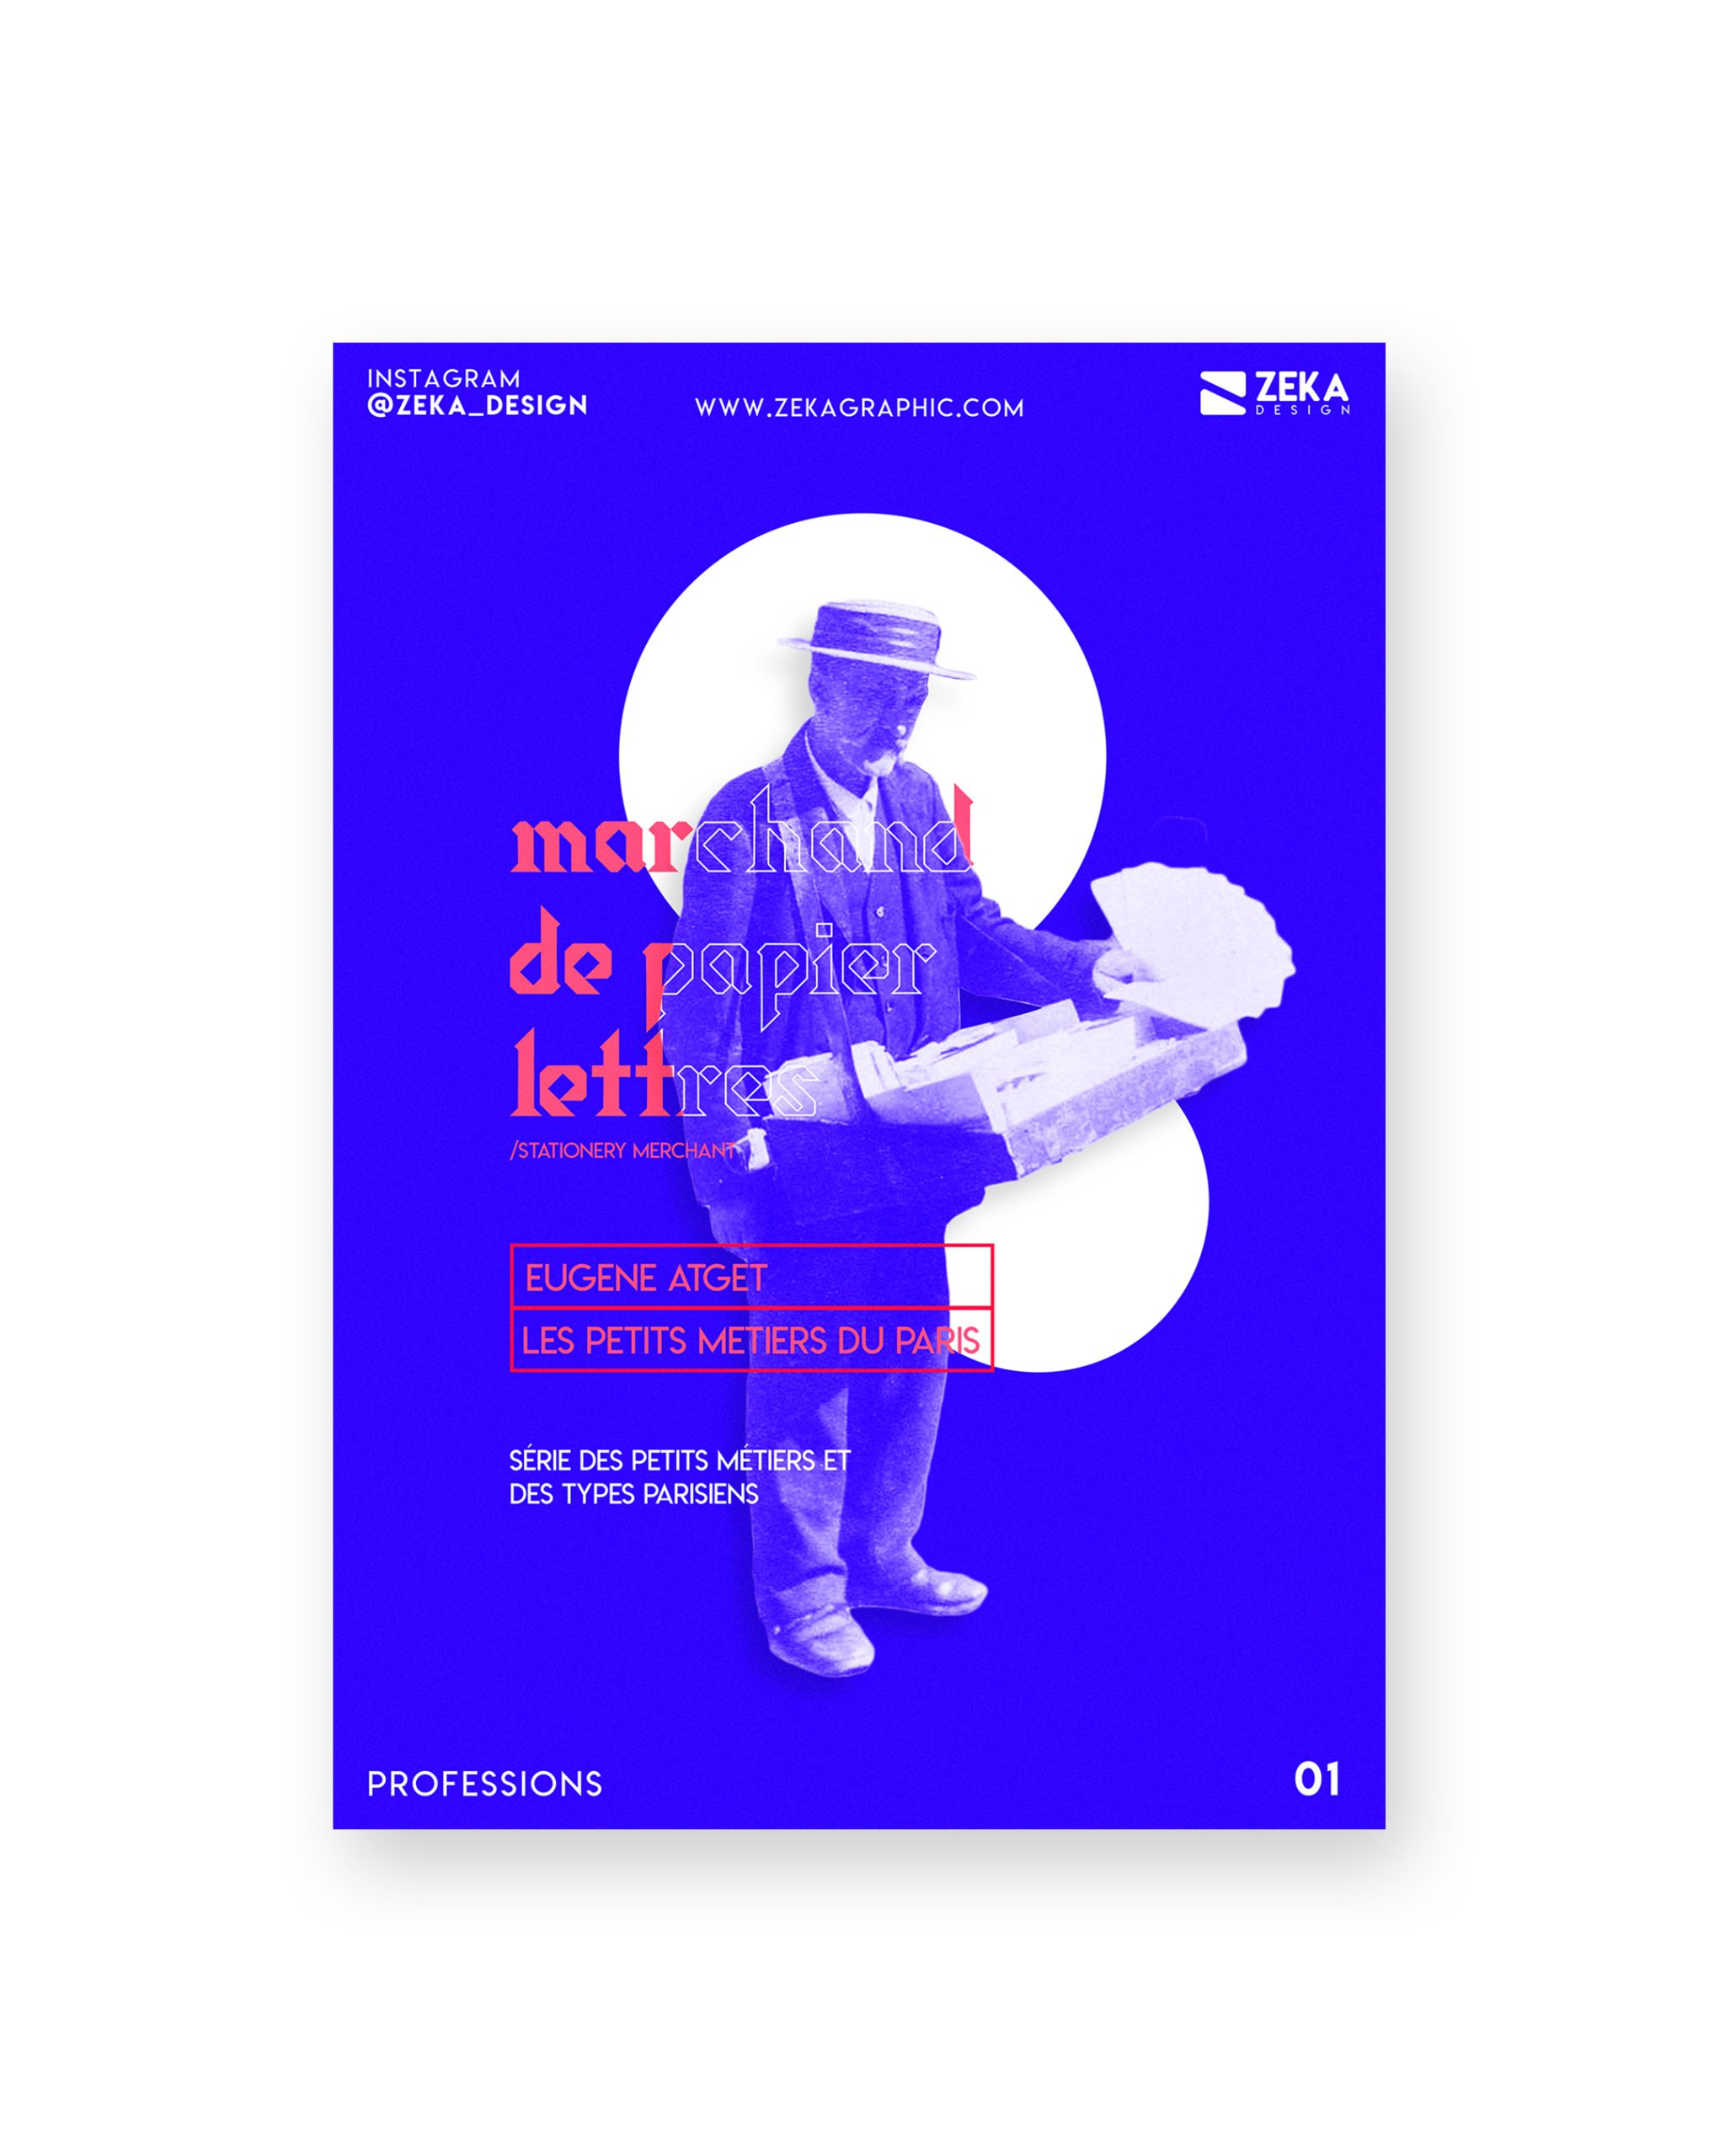 2020 Professions White Poster Design 01 C